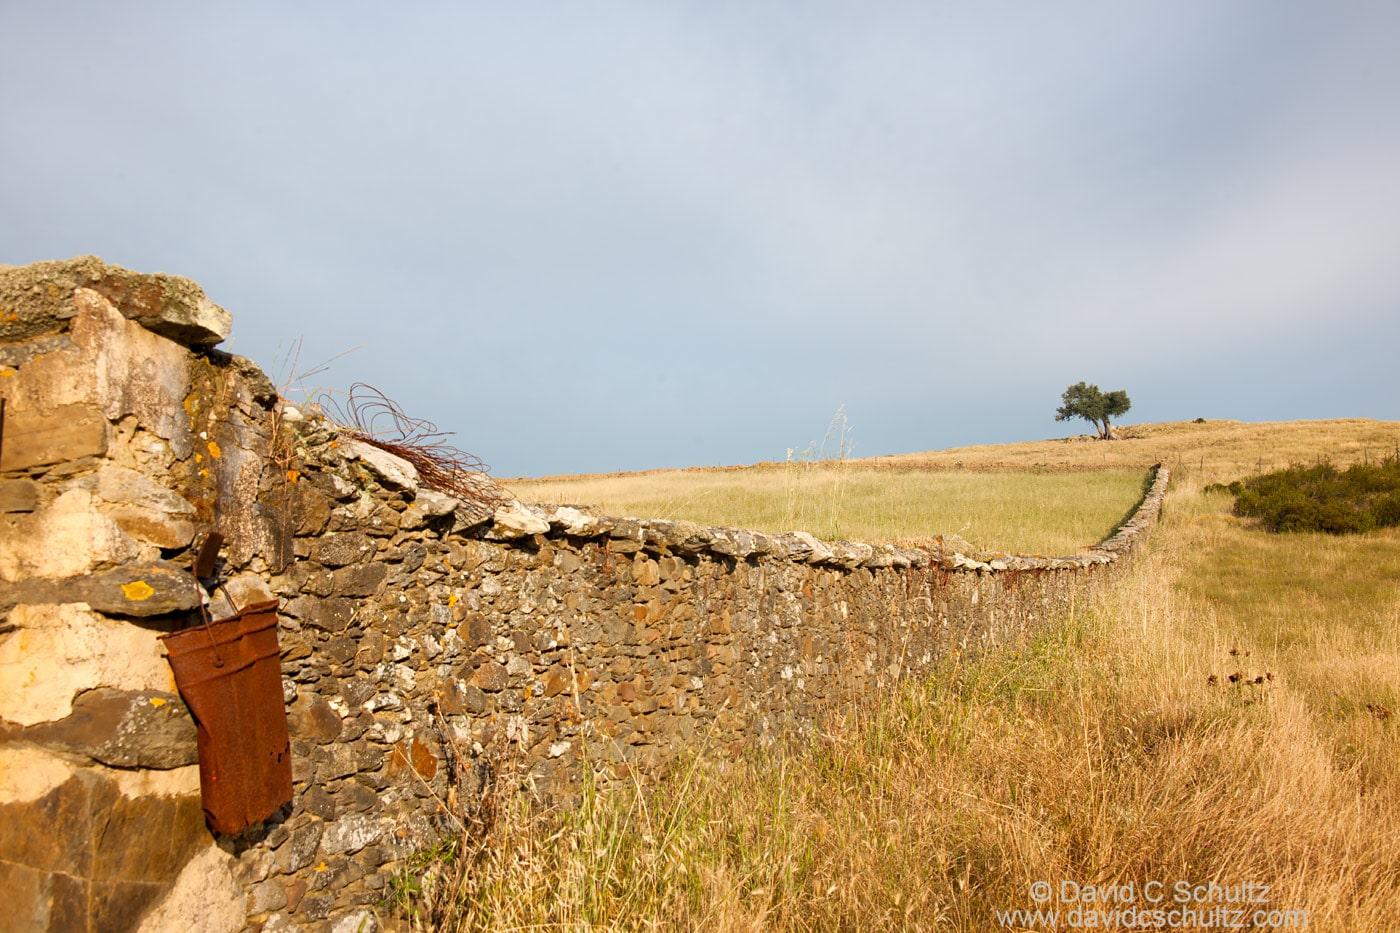 Portugal - Image #203-615